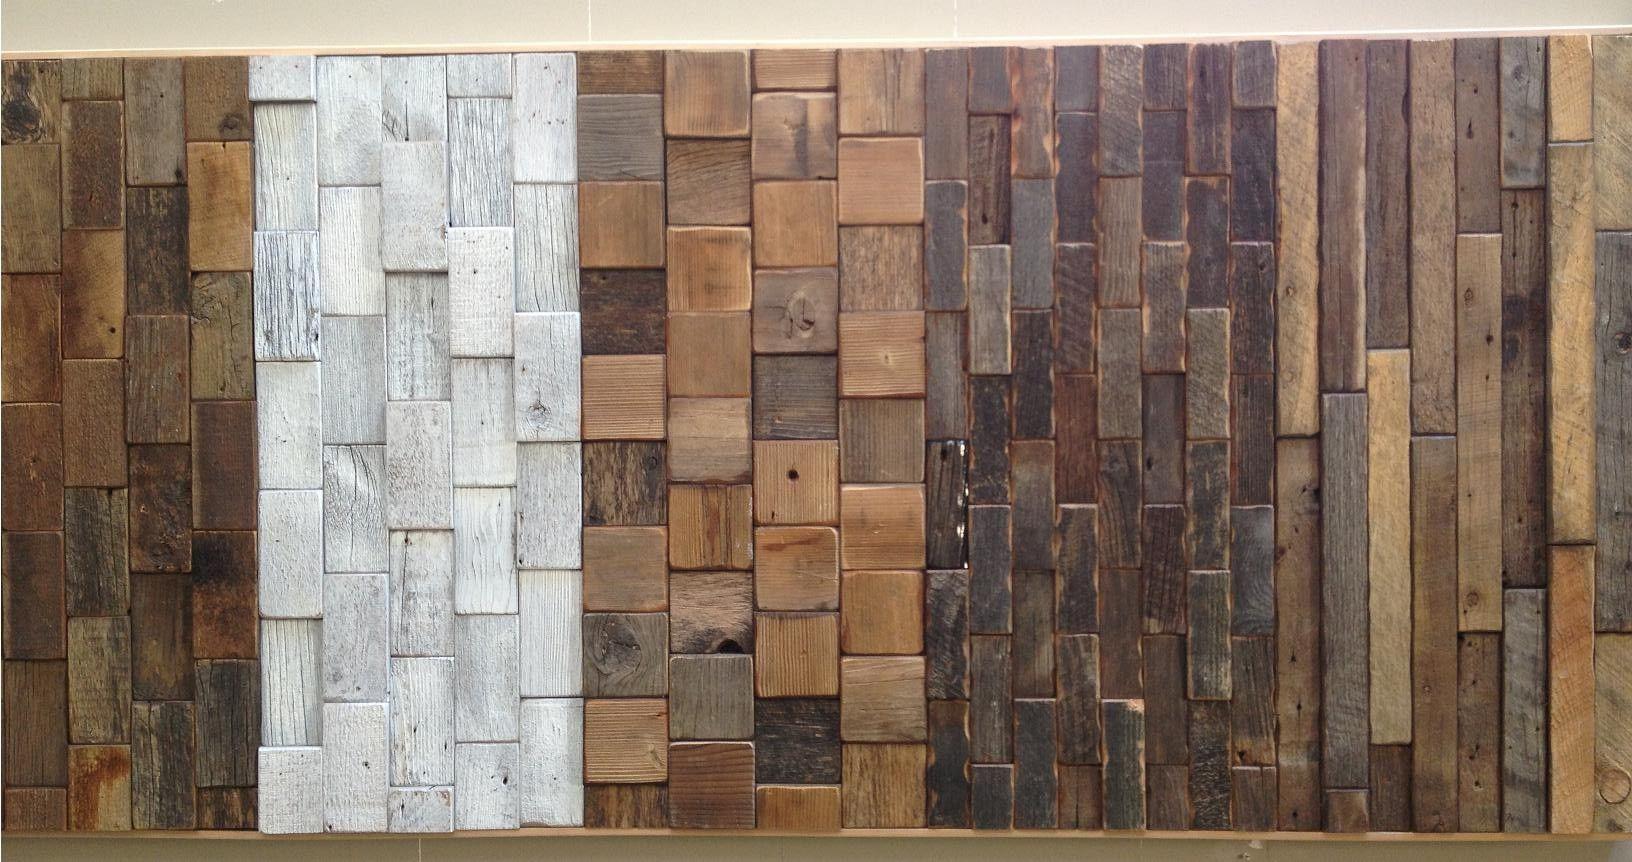 Everitt schilling reclaimed barn wood wall tiles tile everitt schilling reclaimed barn wood wall tiles dailygadgetfo Images